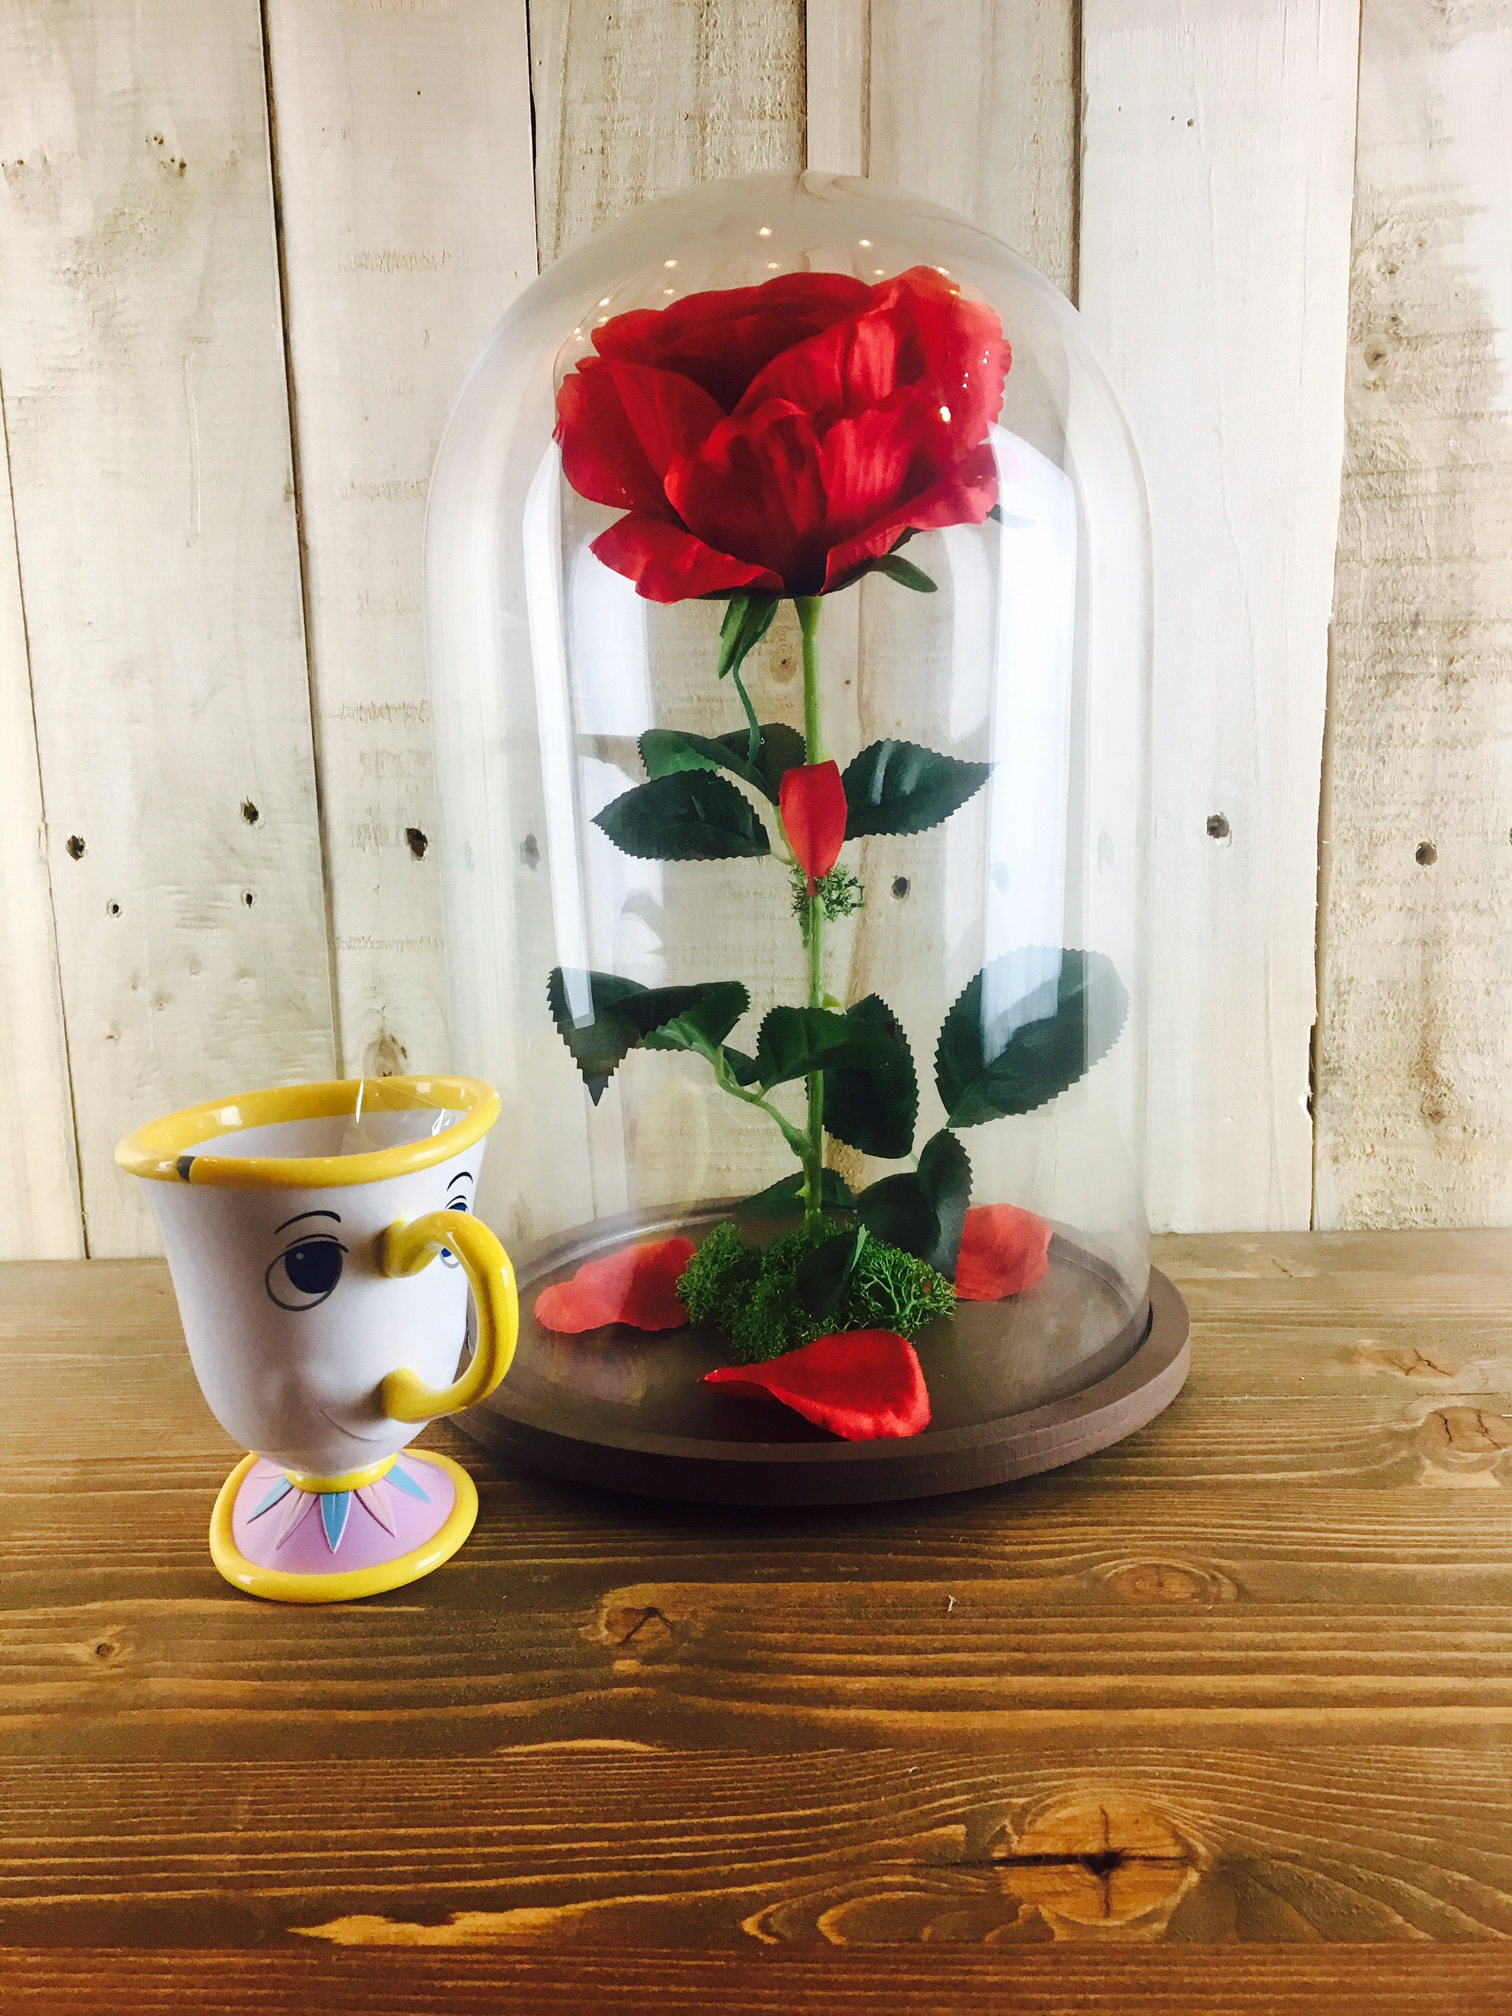 la rosa encantada amazon regalo